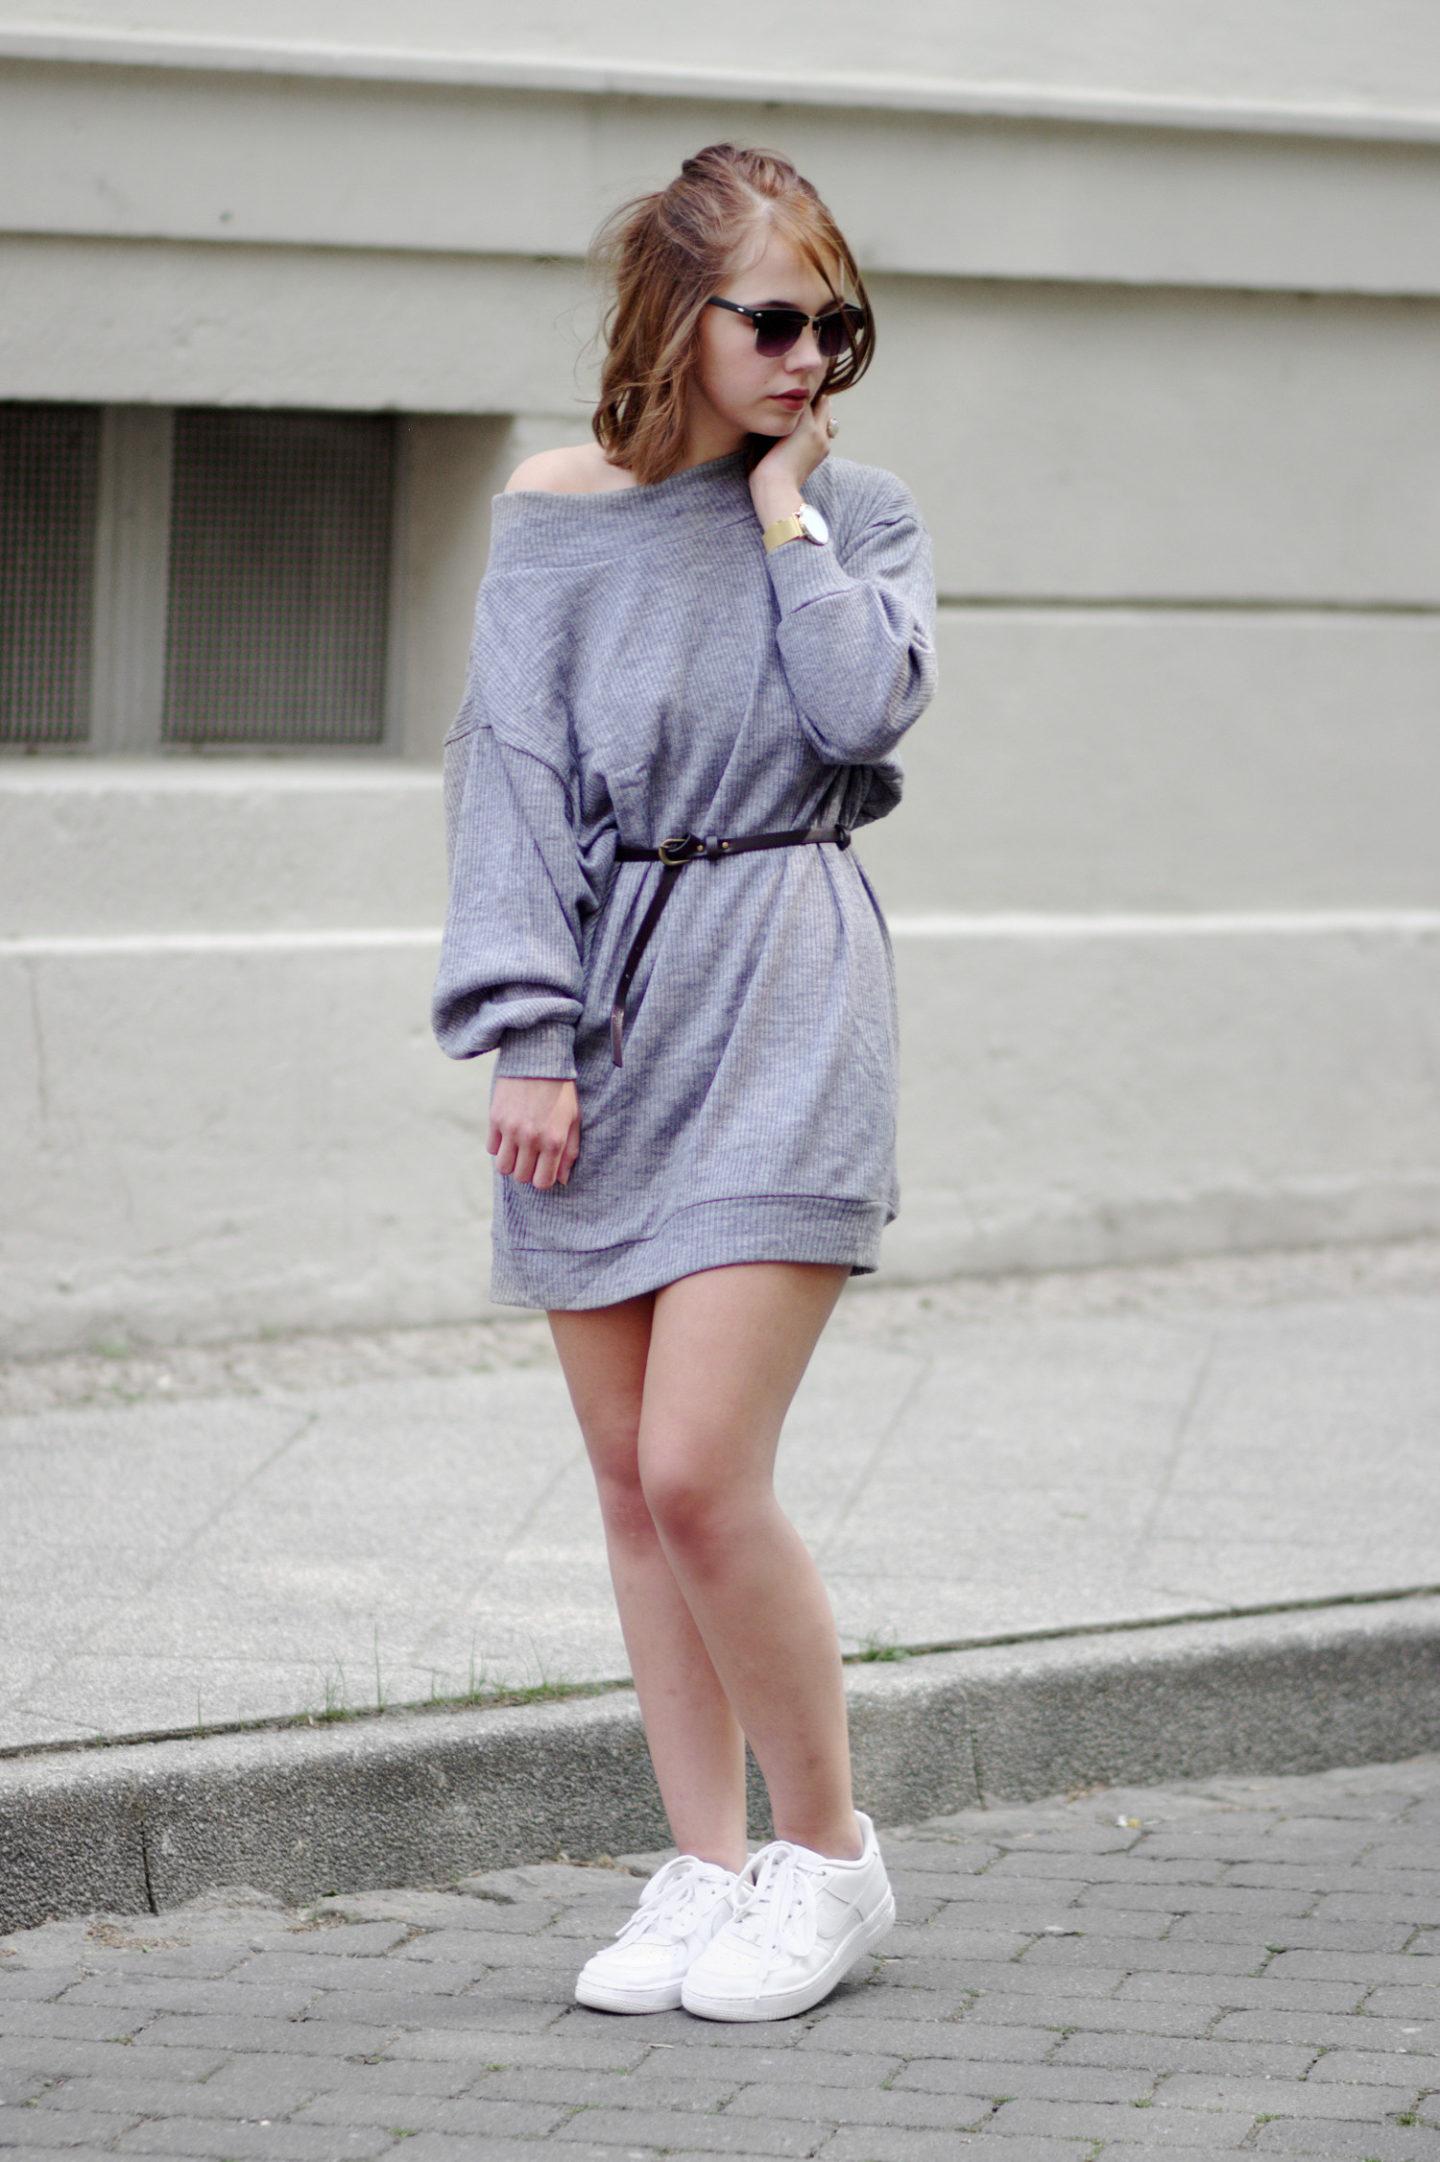 bezauberndenana fashionblog outfit streetstyle oversize